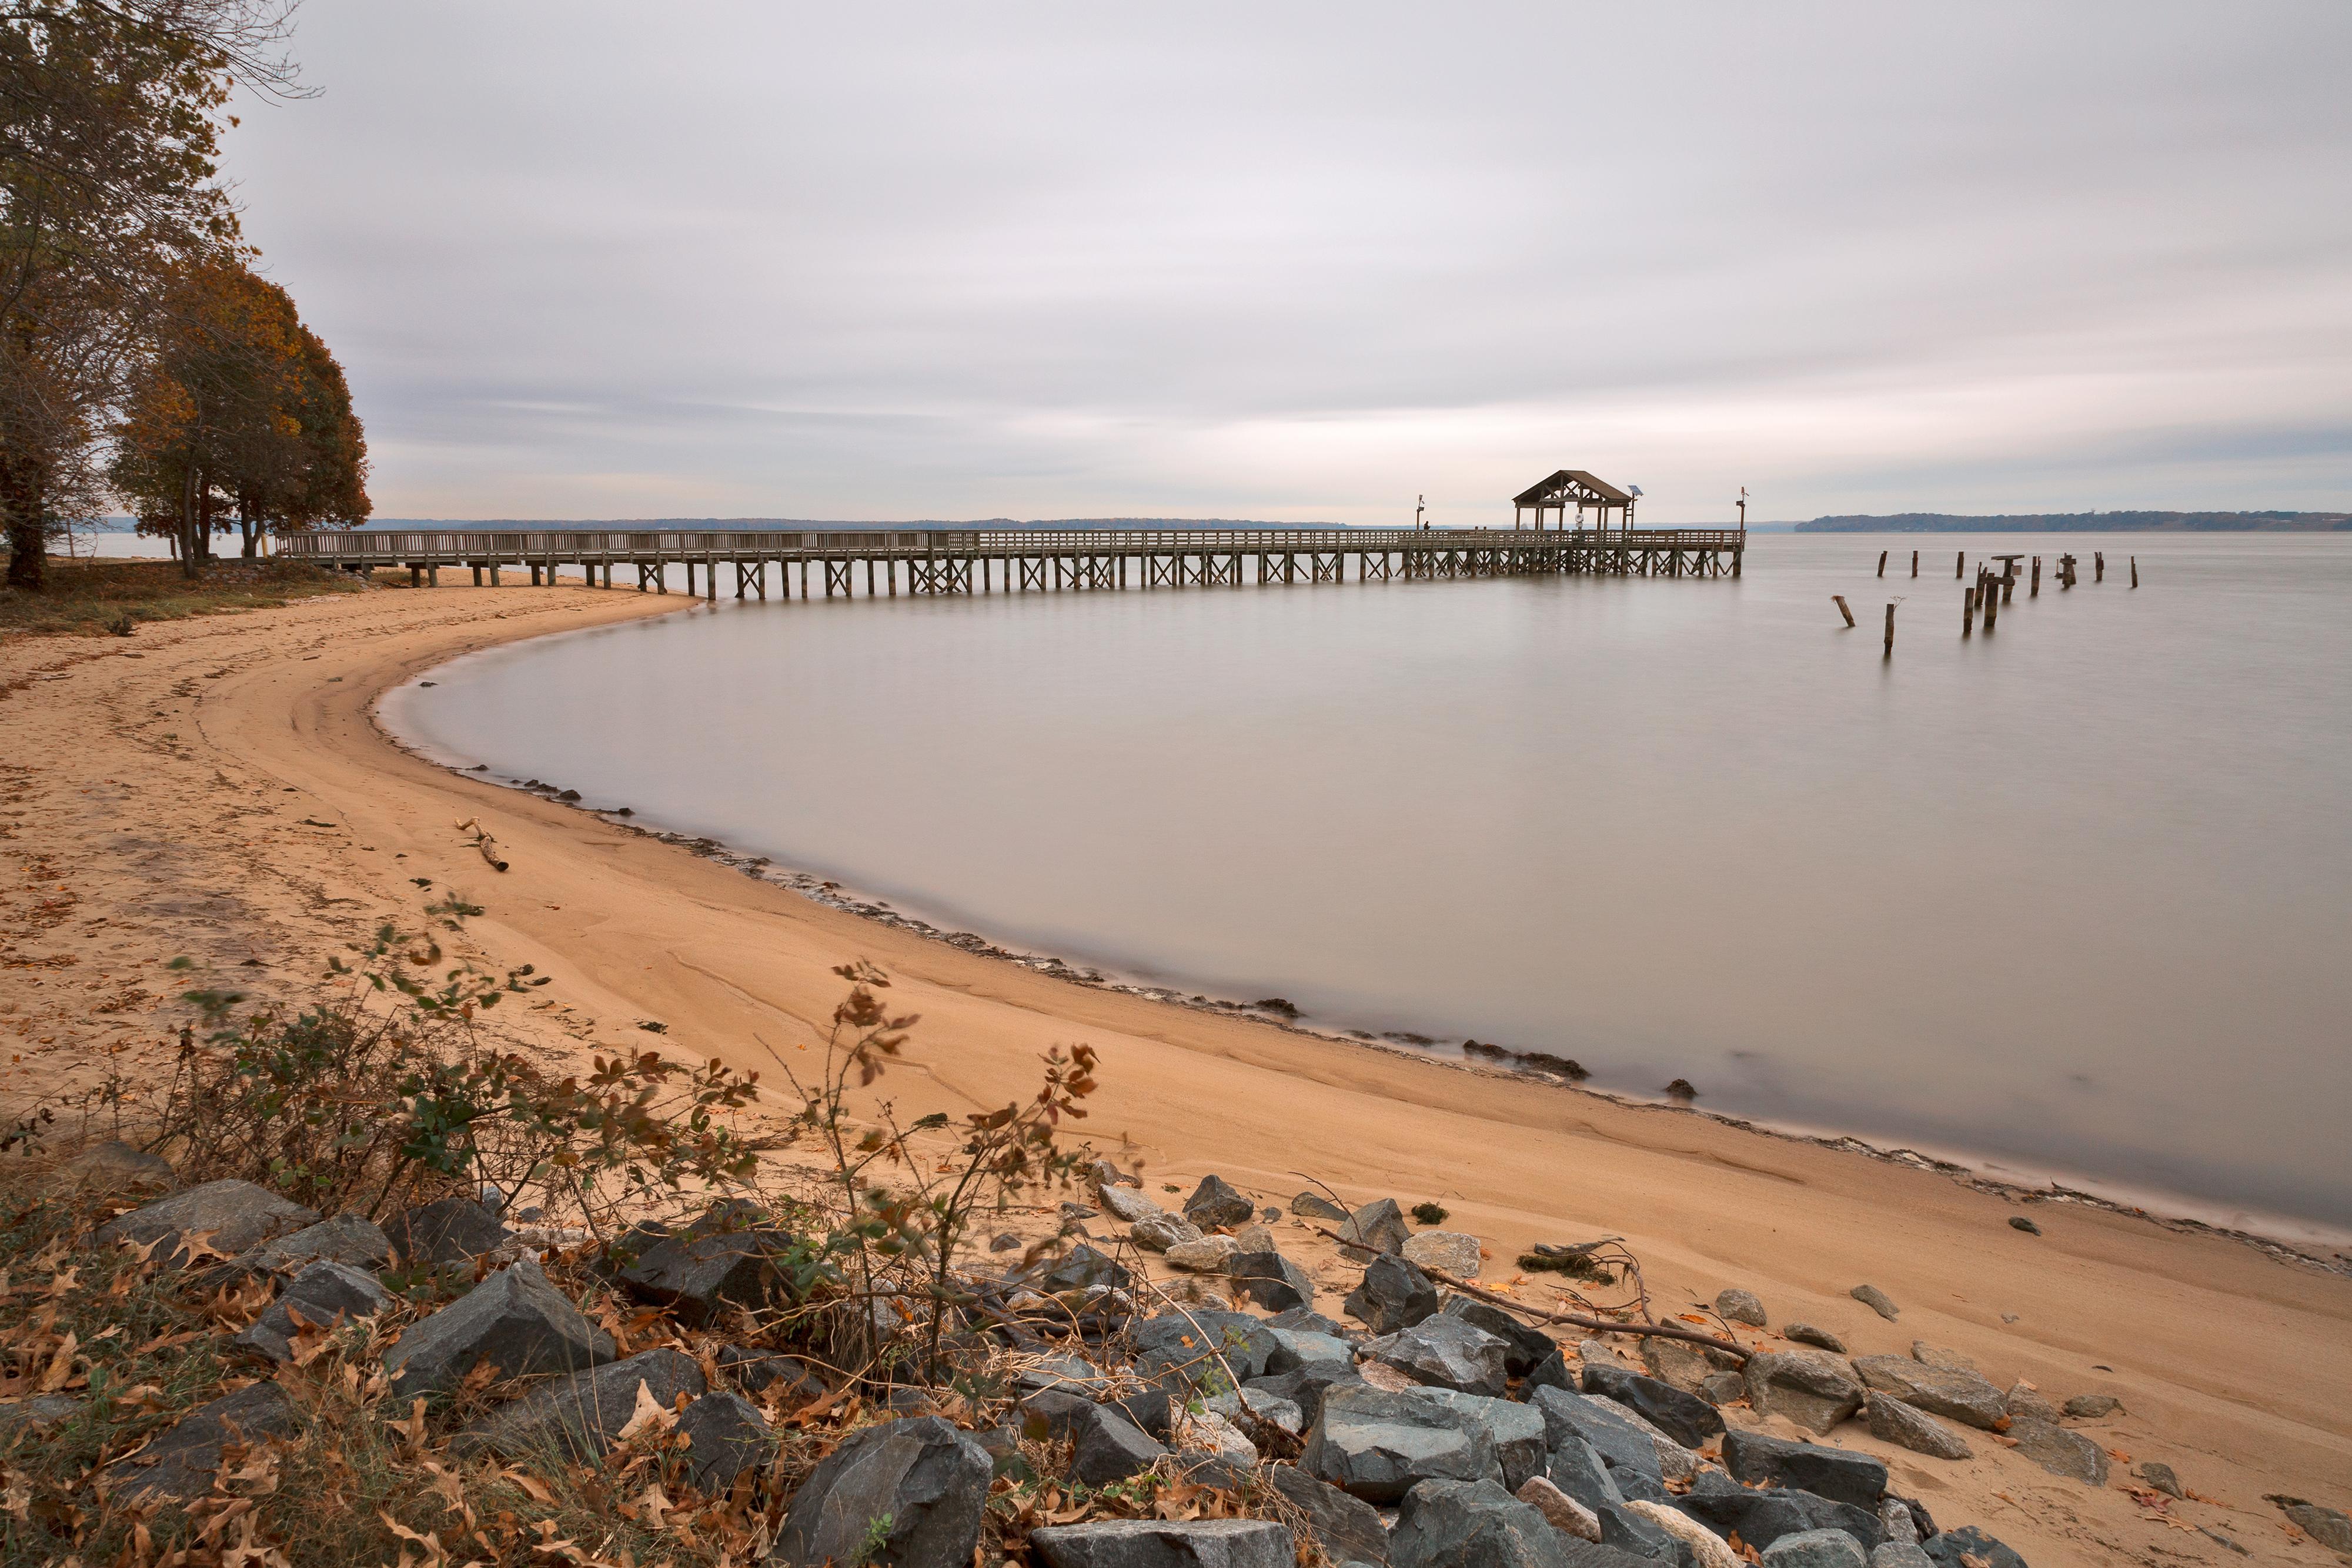 Leesylvania beach pier photo